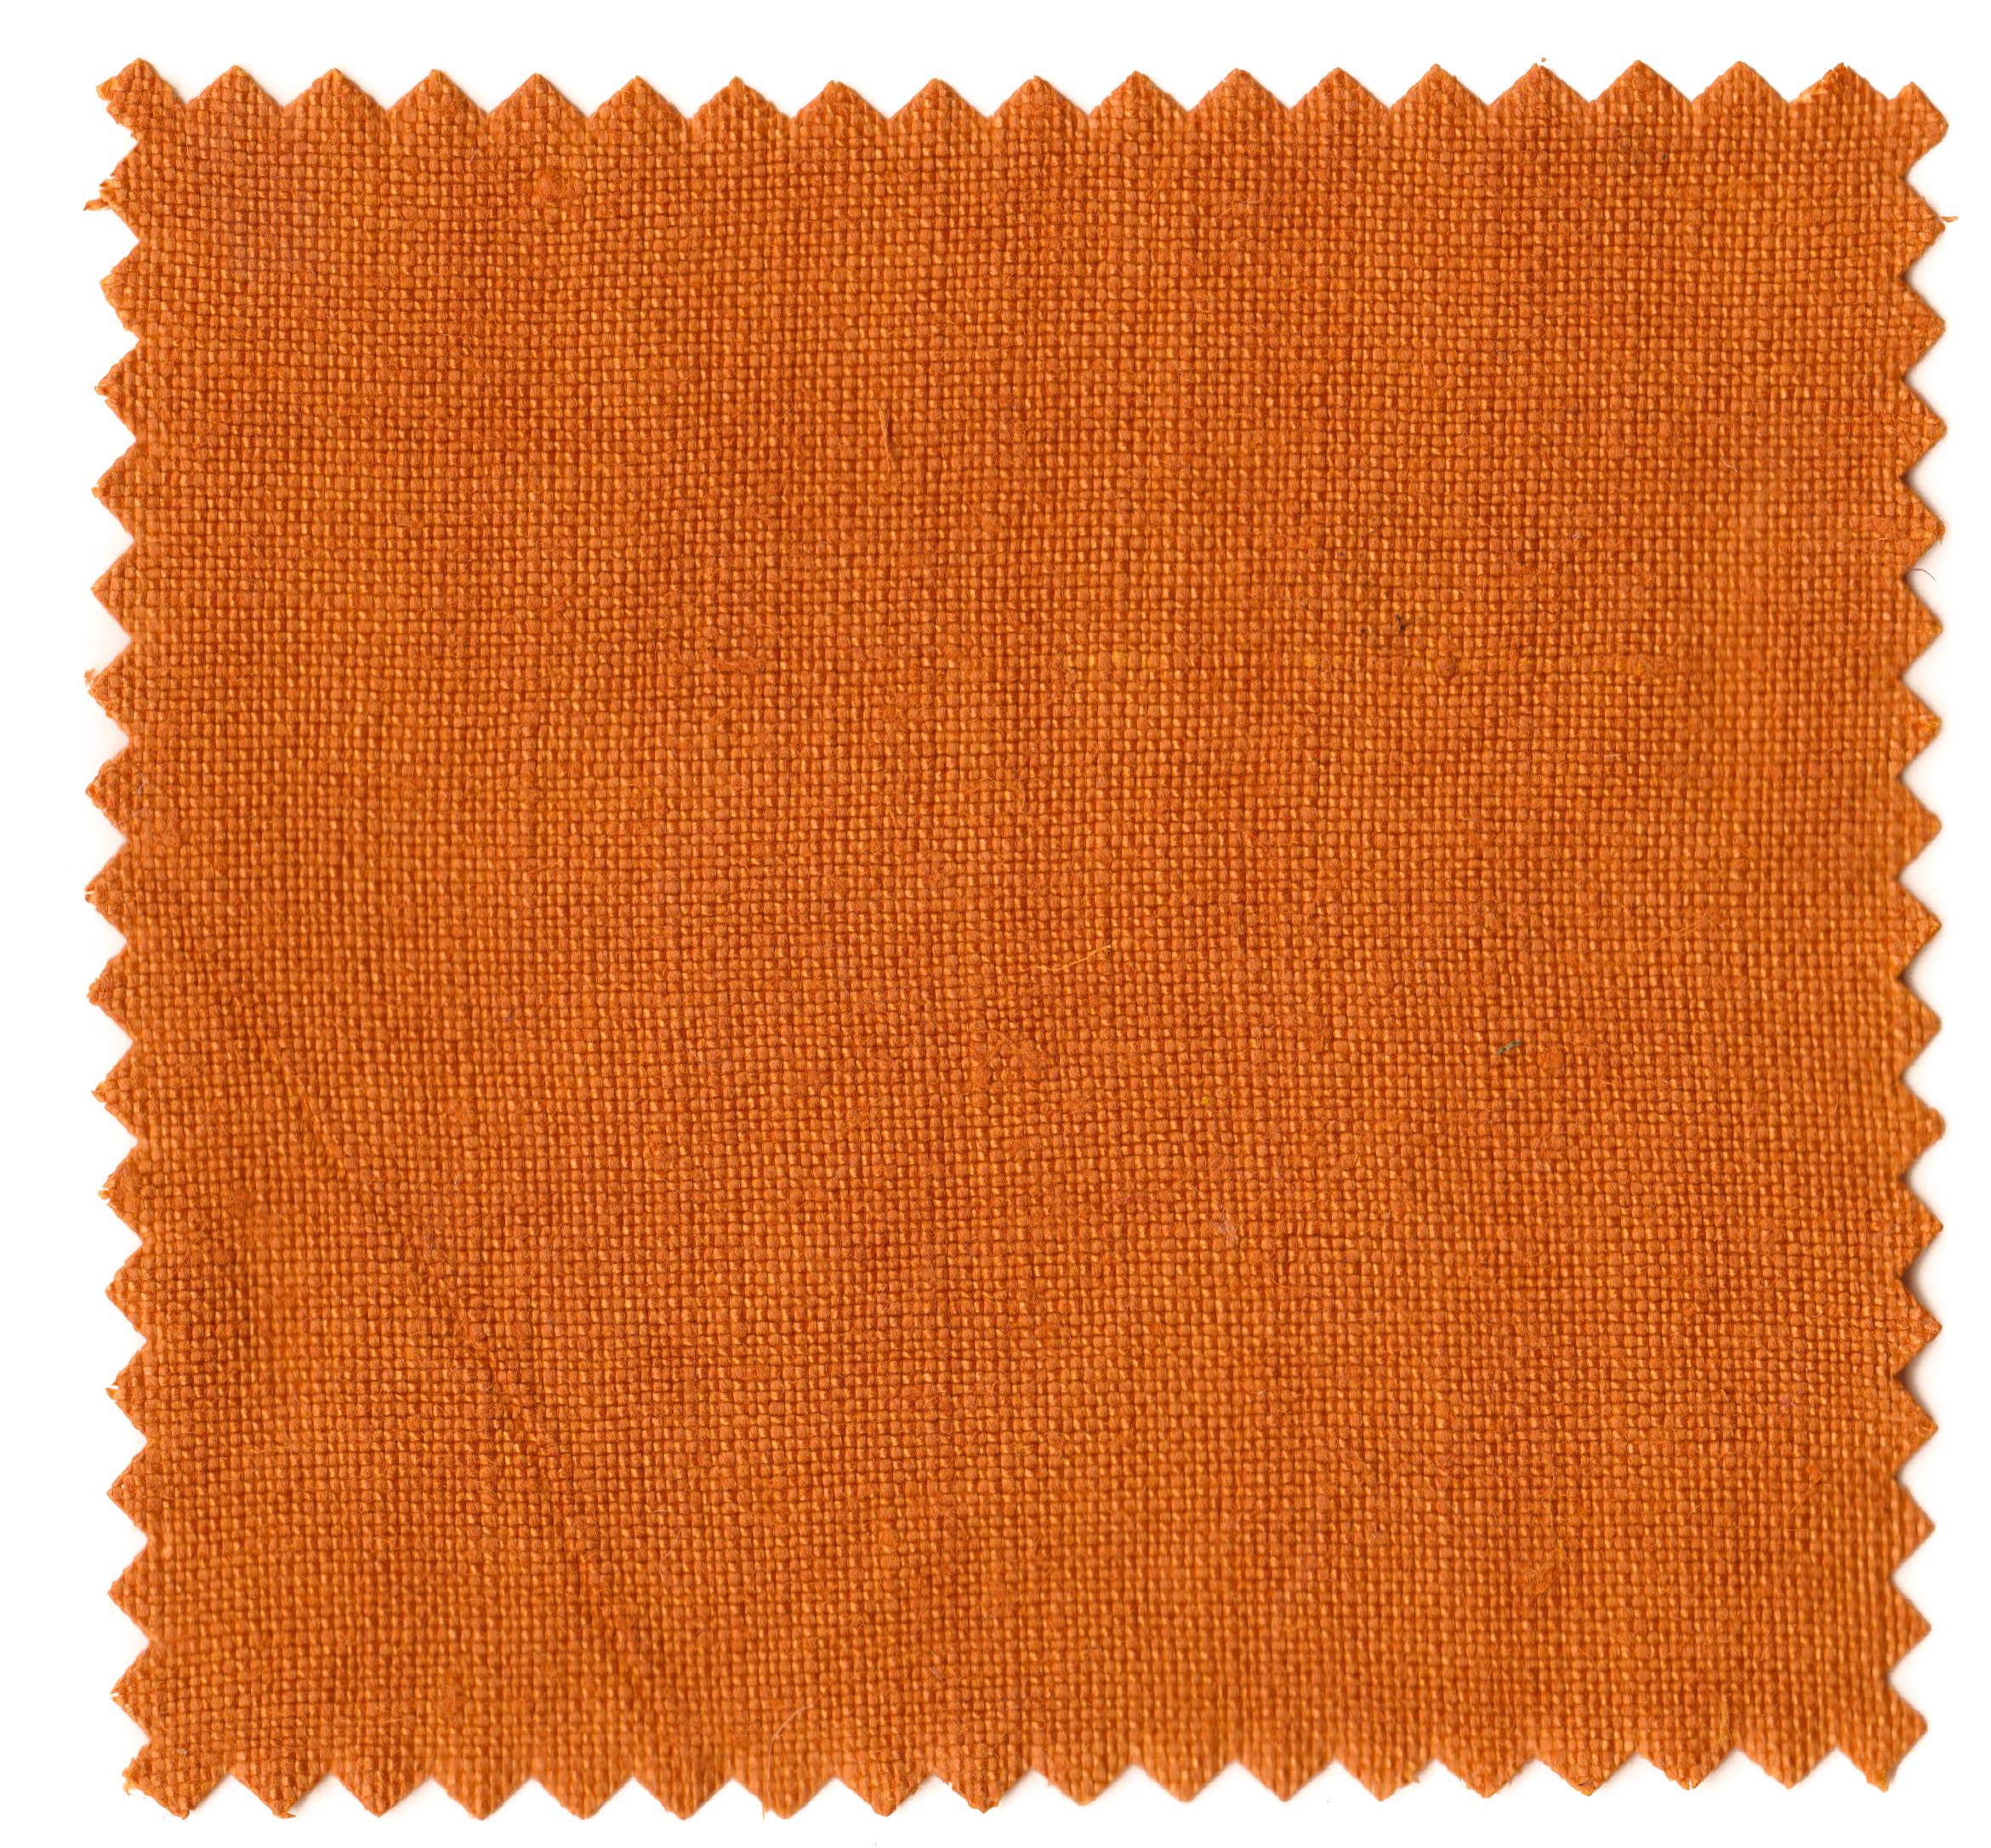 Saffron Umbers-4.jpg